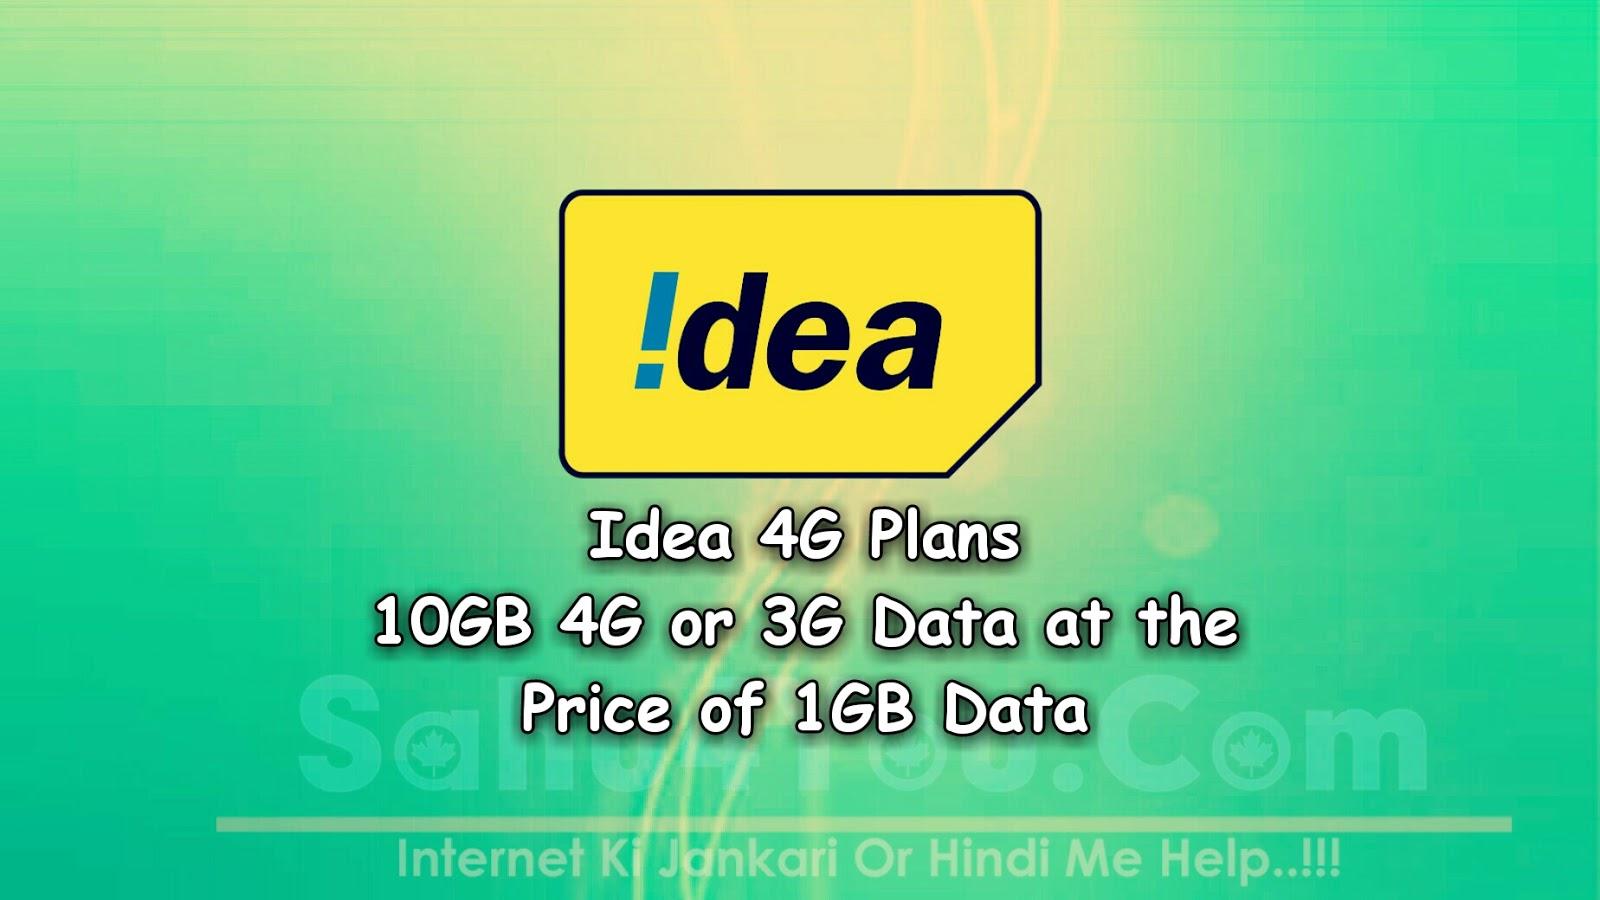 Idea 4G Plans : 10GB 4G or 3G Data at the Price of 1GB Data